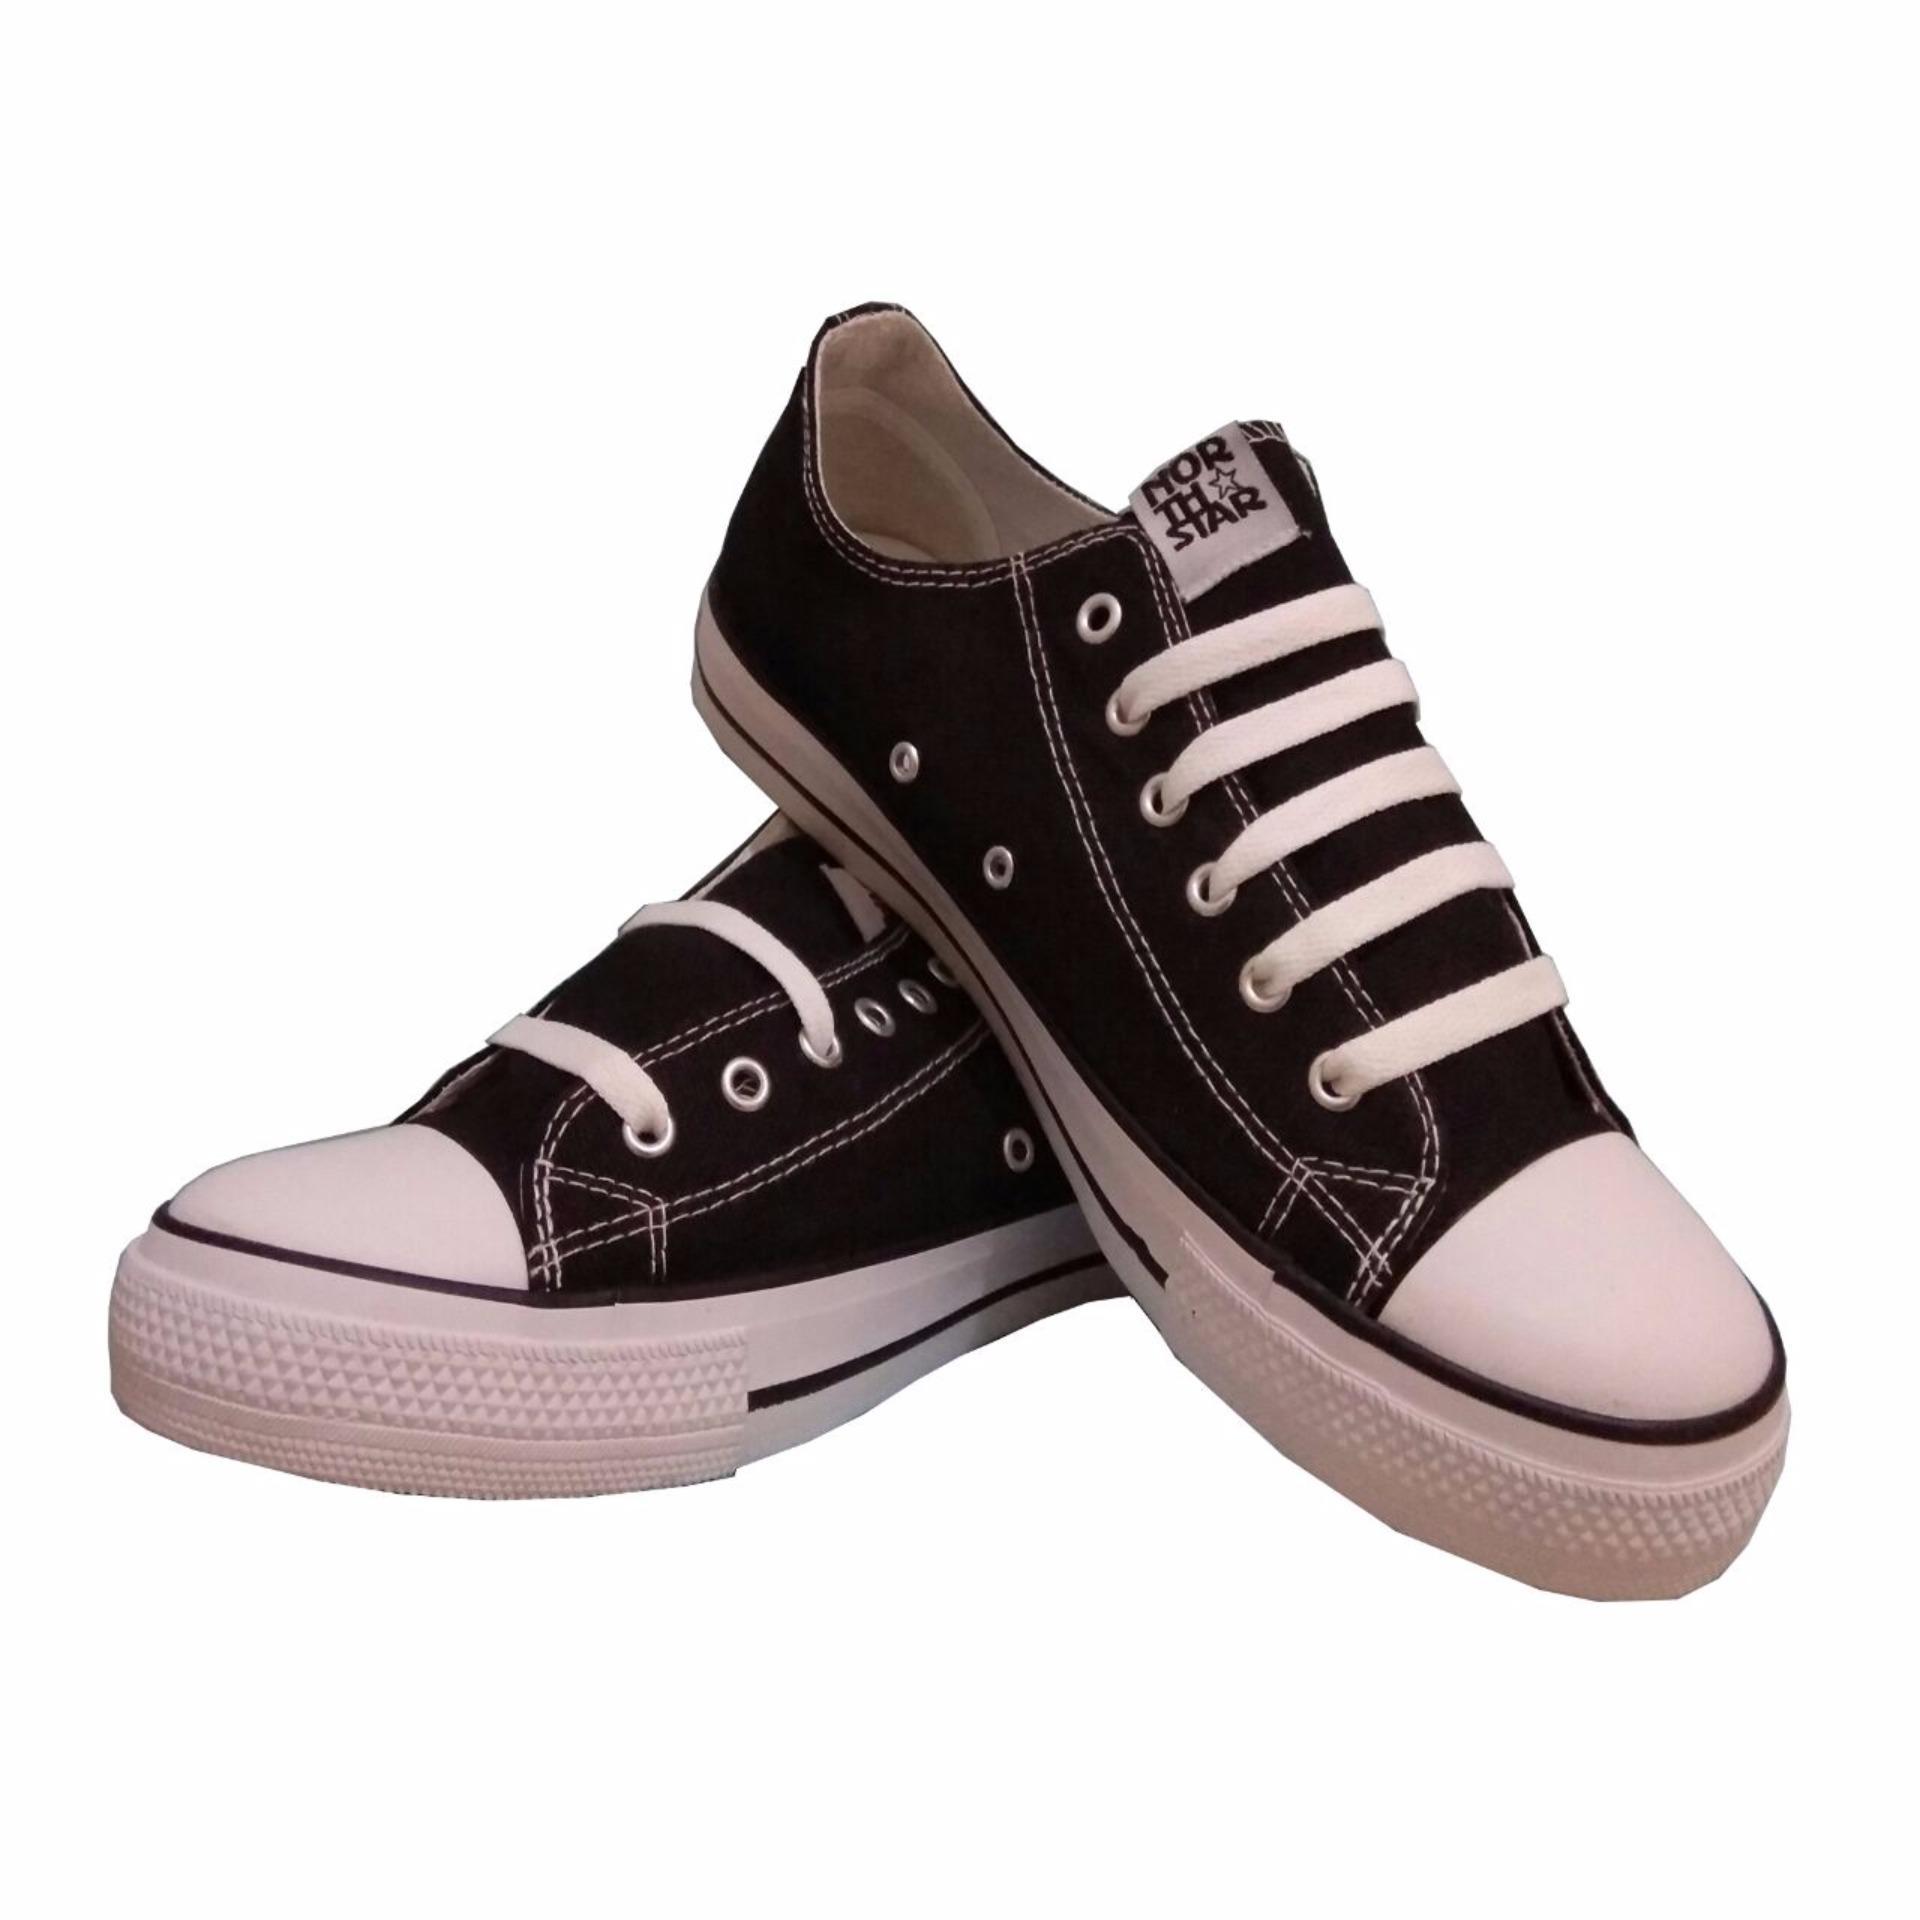 Jual Sepatu North Star Low Cut Black White Branded